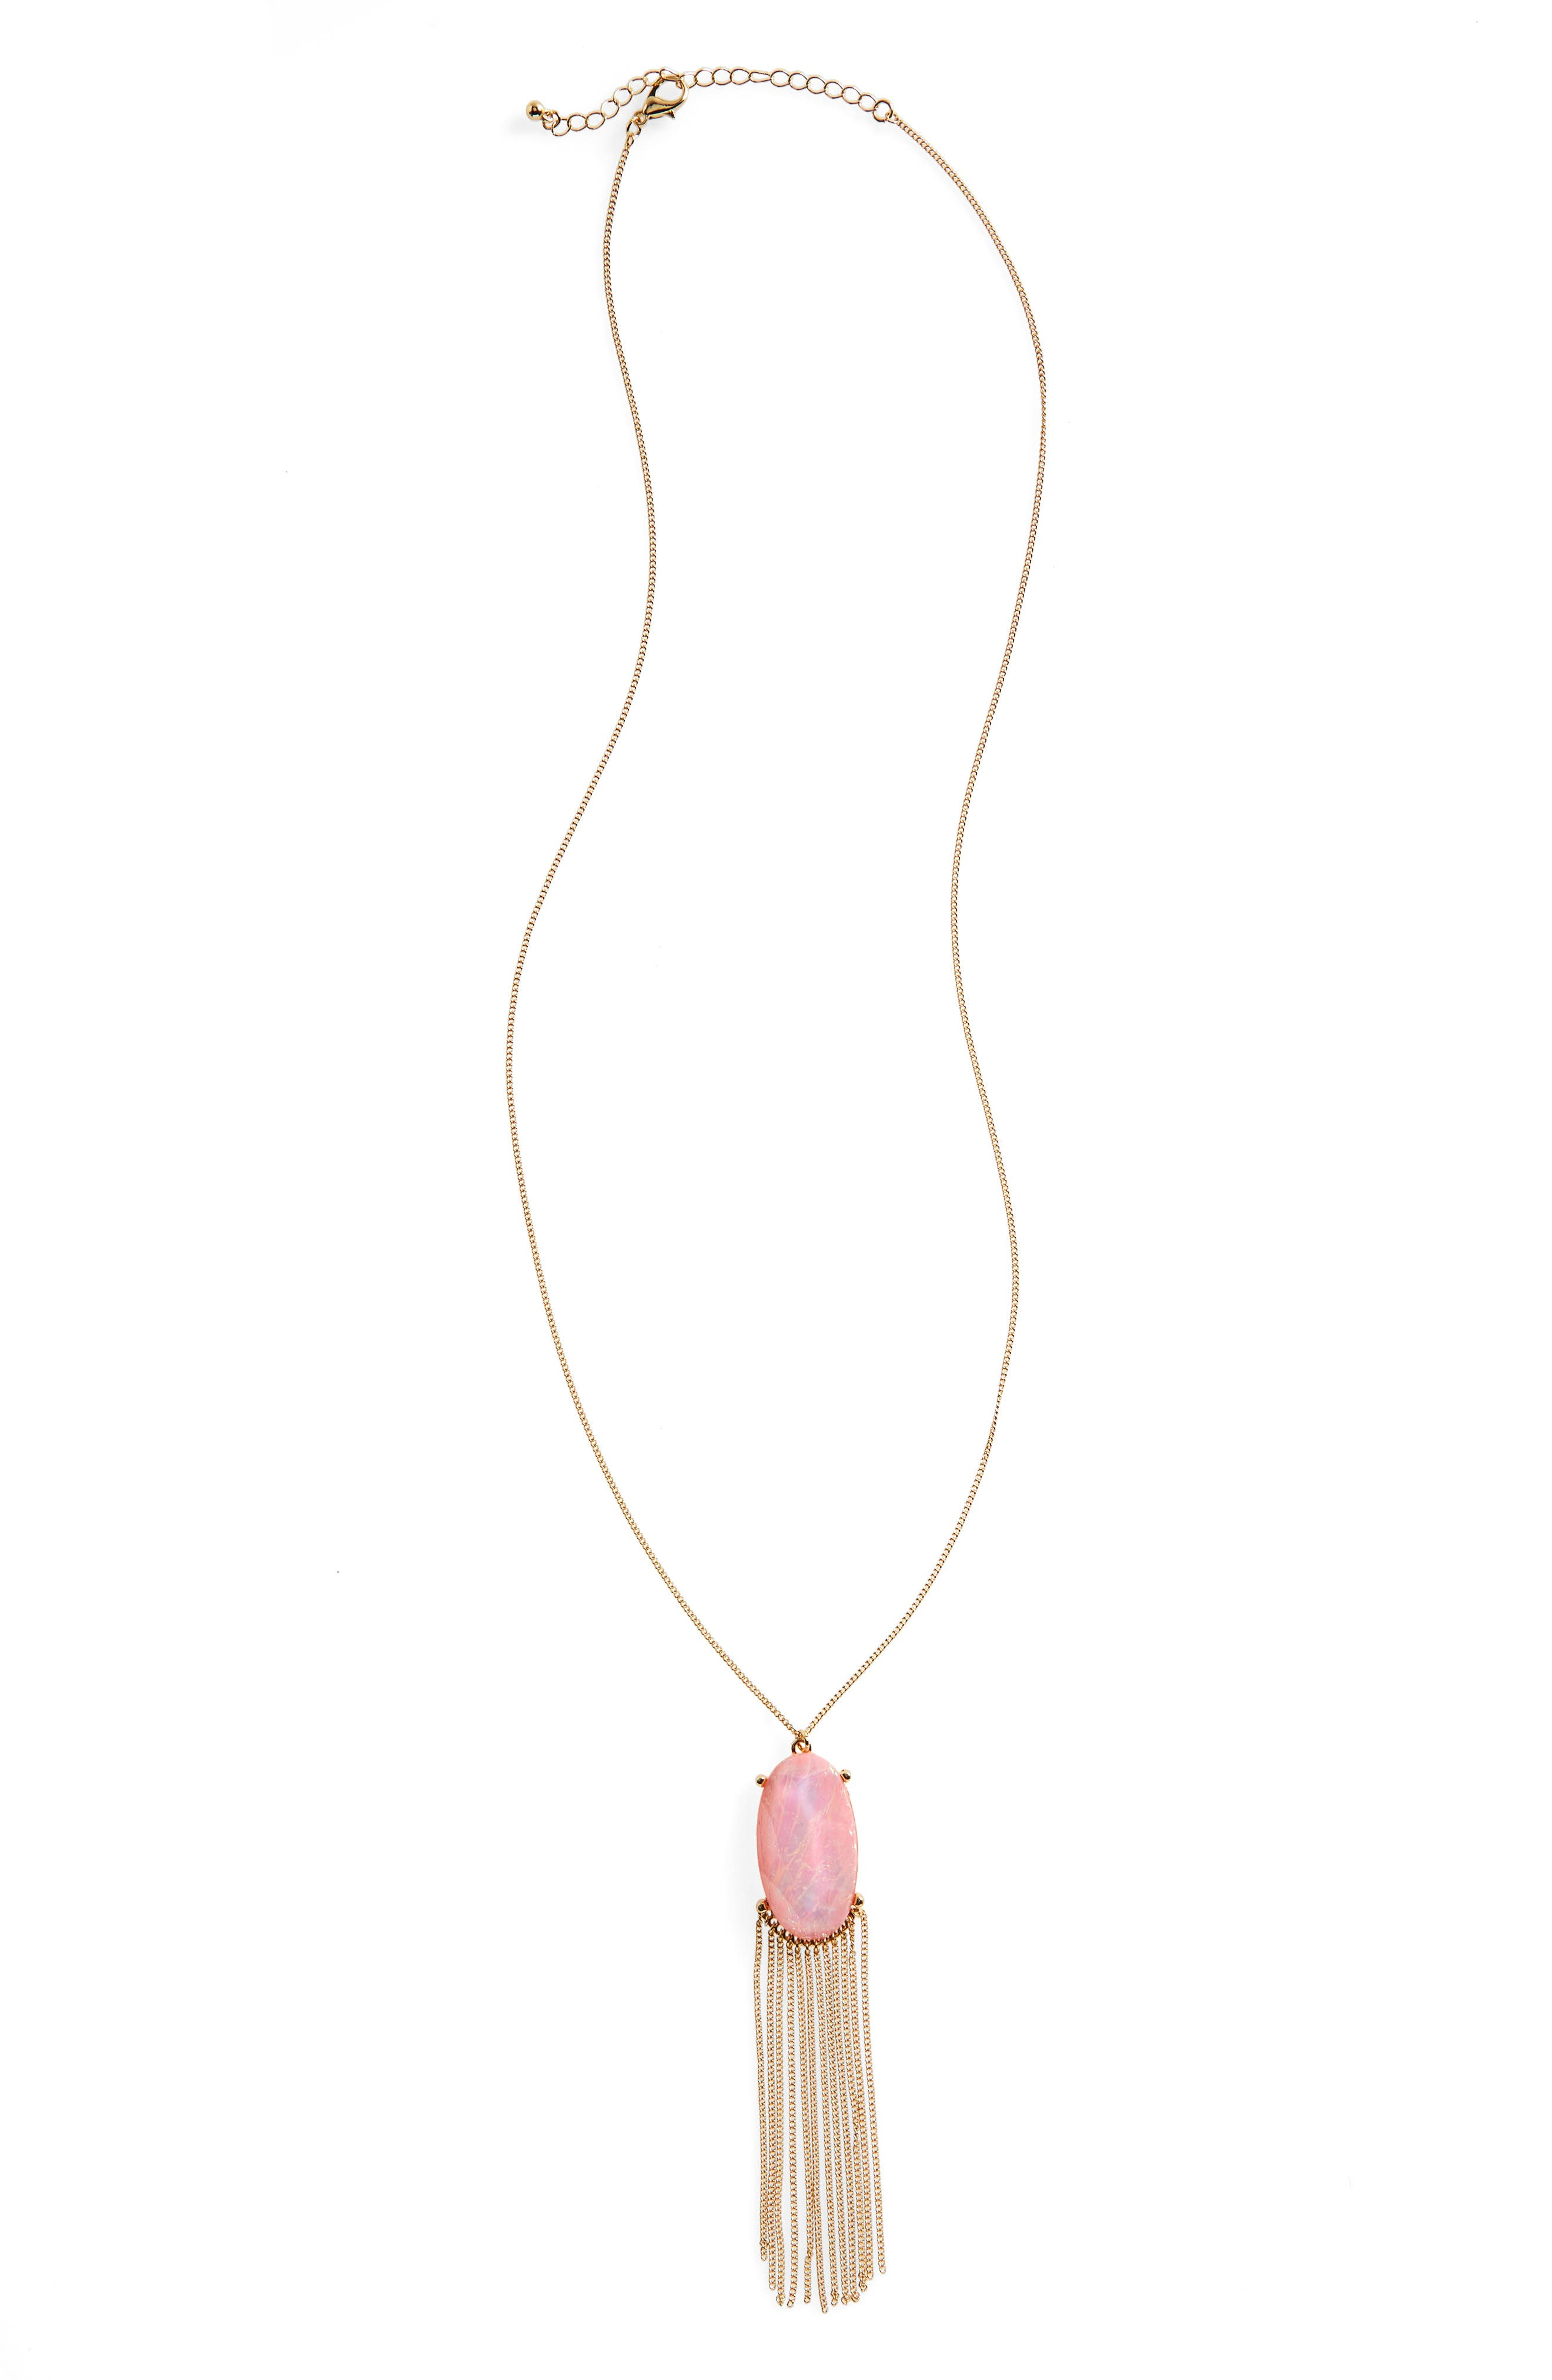 Main Image - BP. Stone & Tassel Pendant Necklace